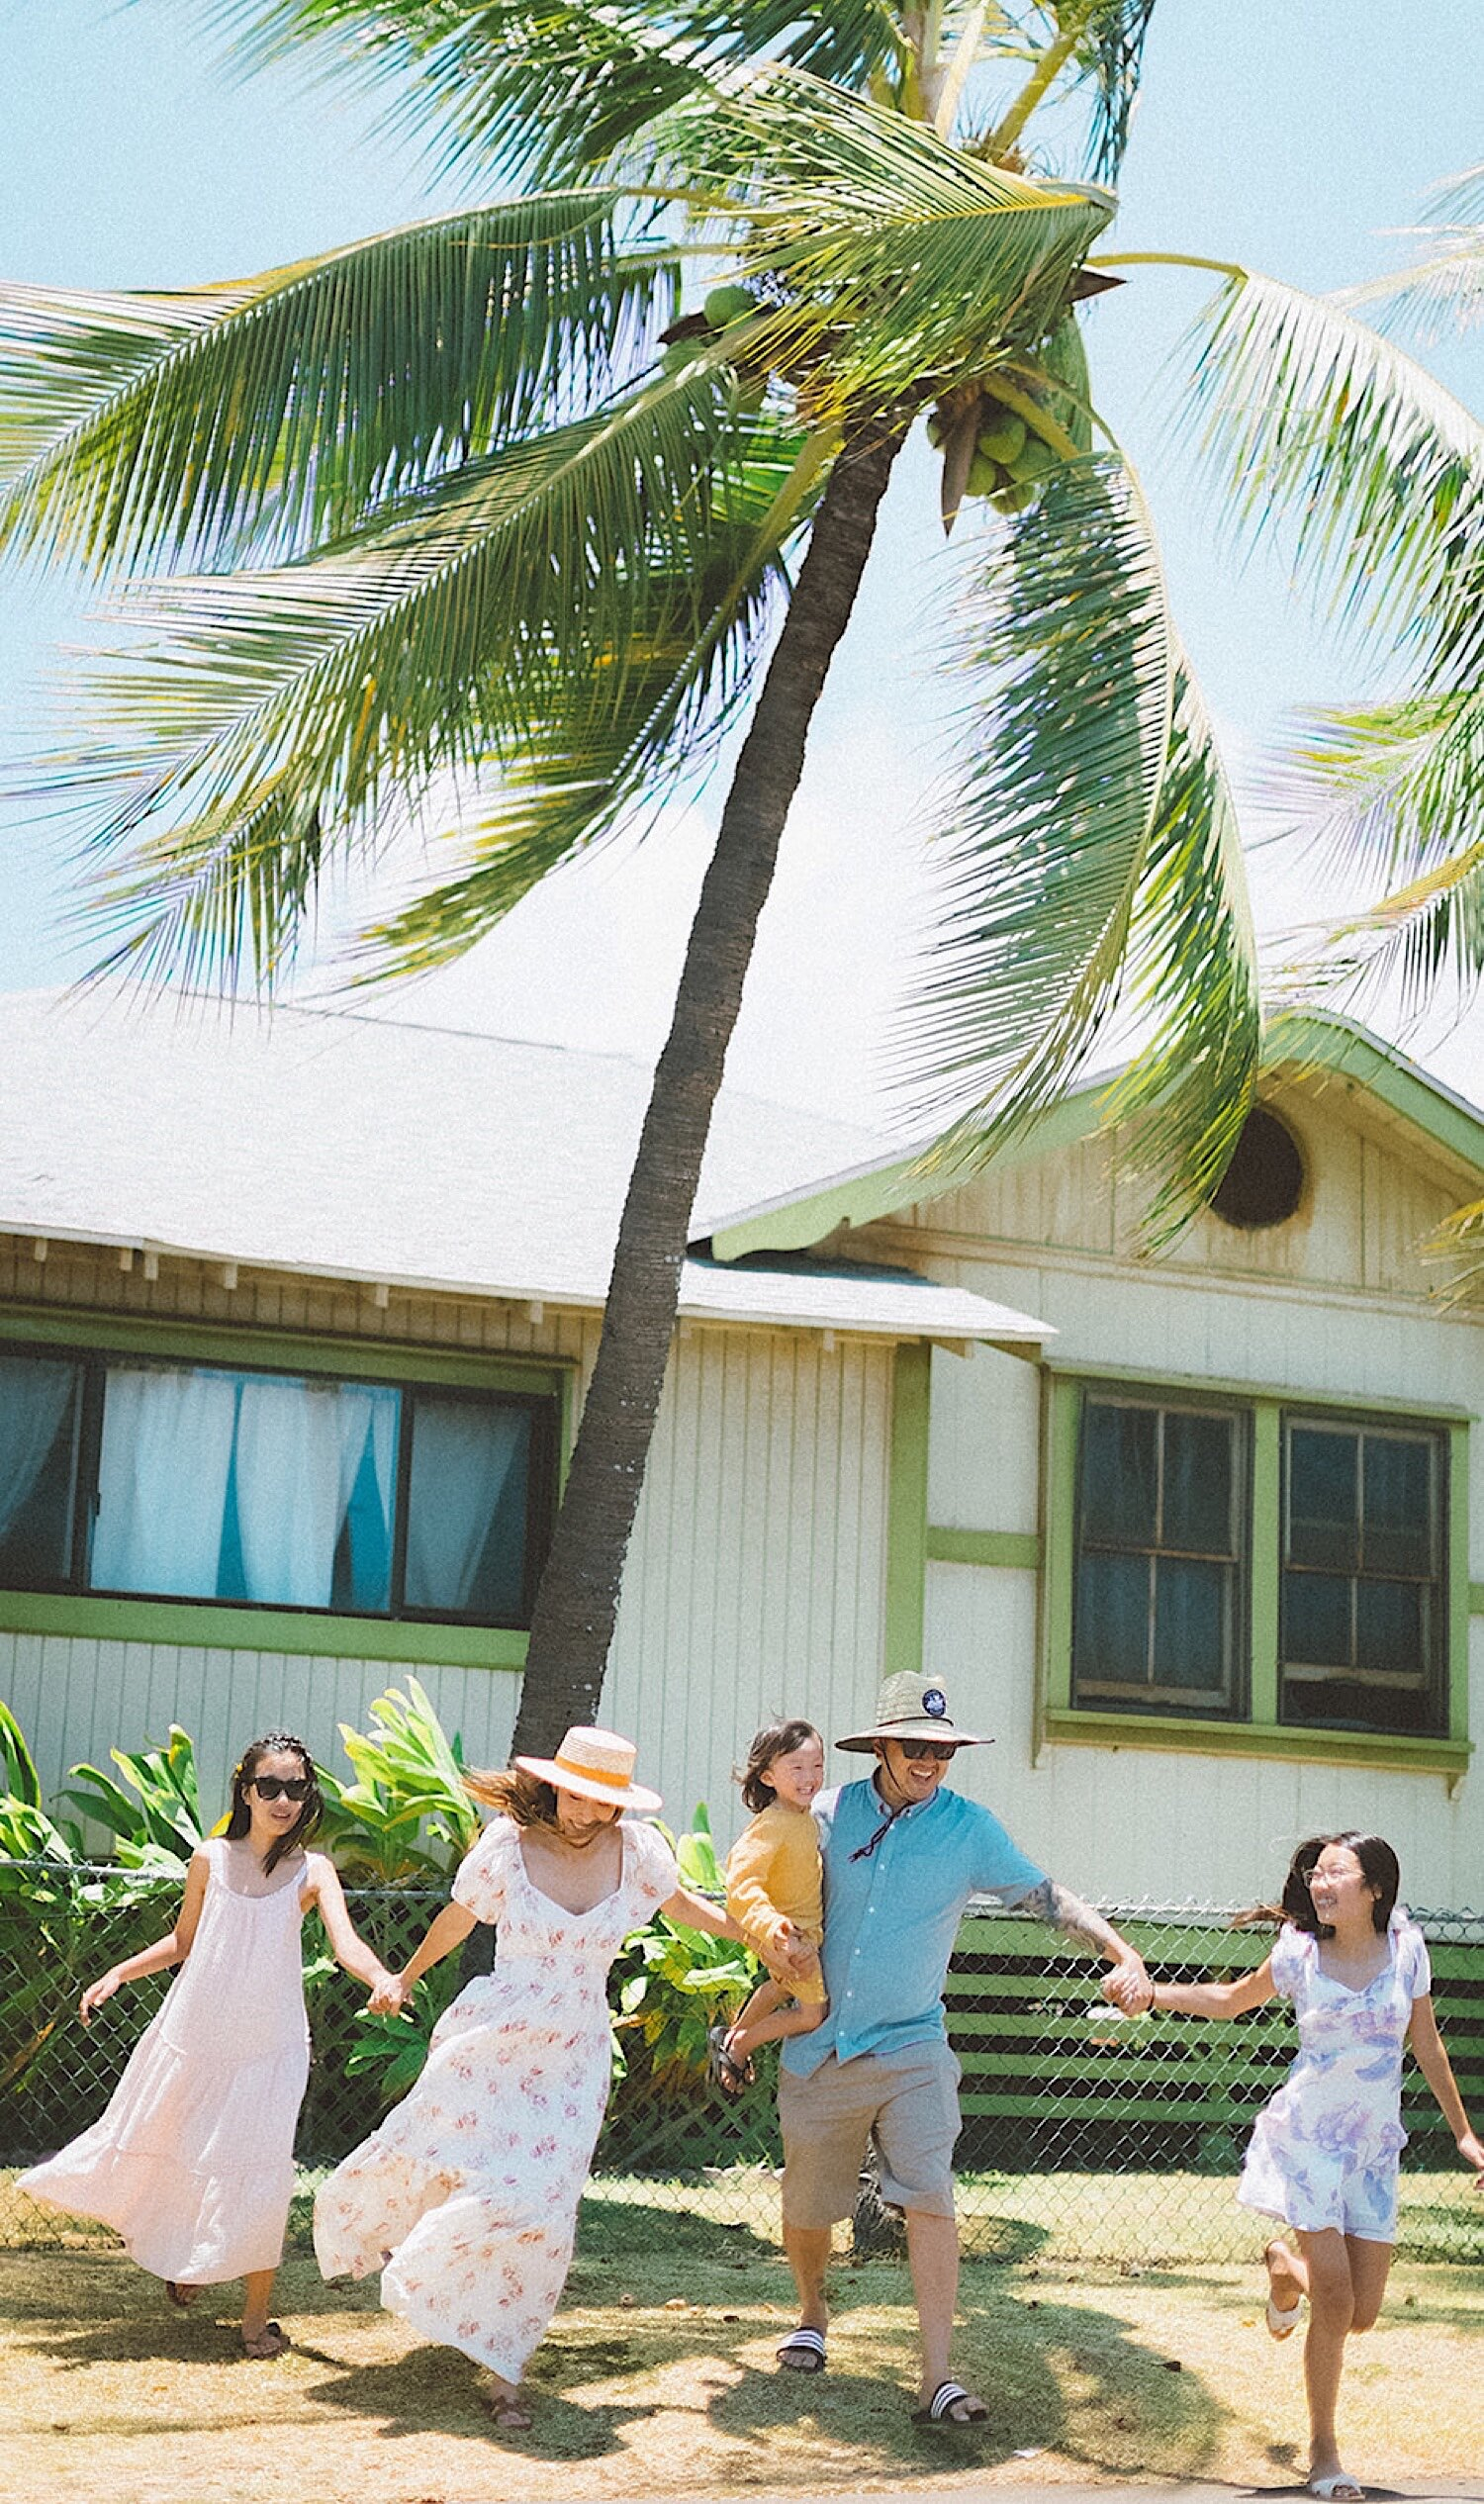 07_holiday maui mini sessions099.jpg